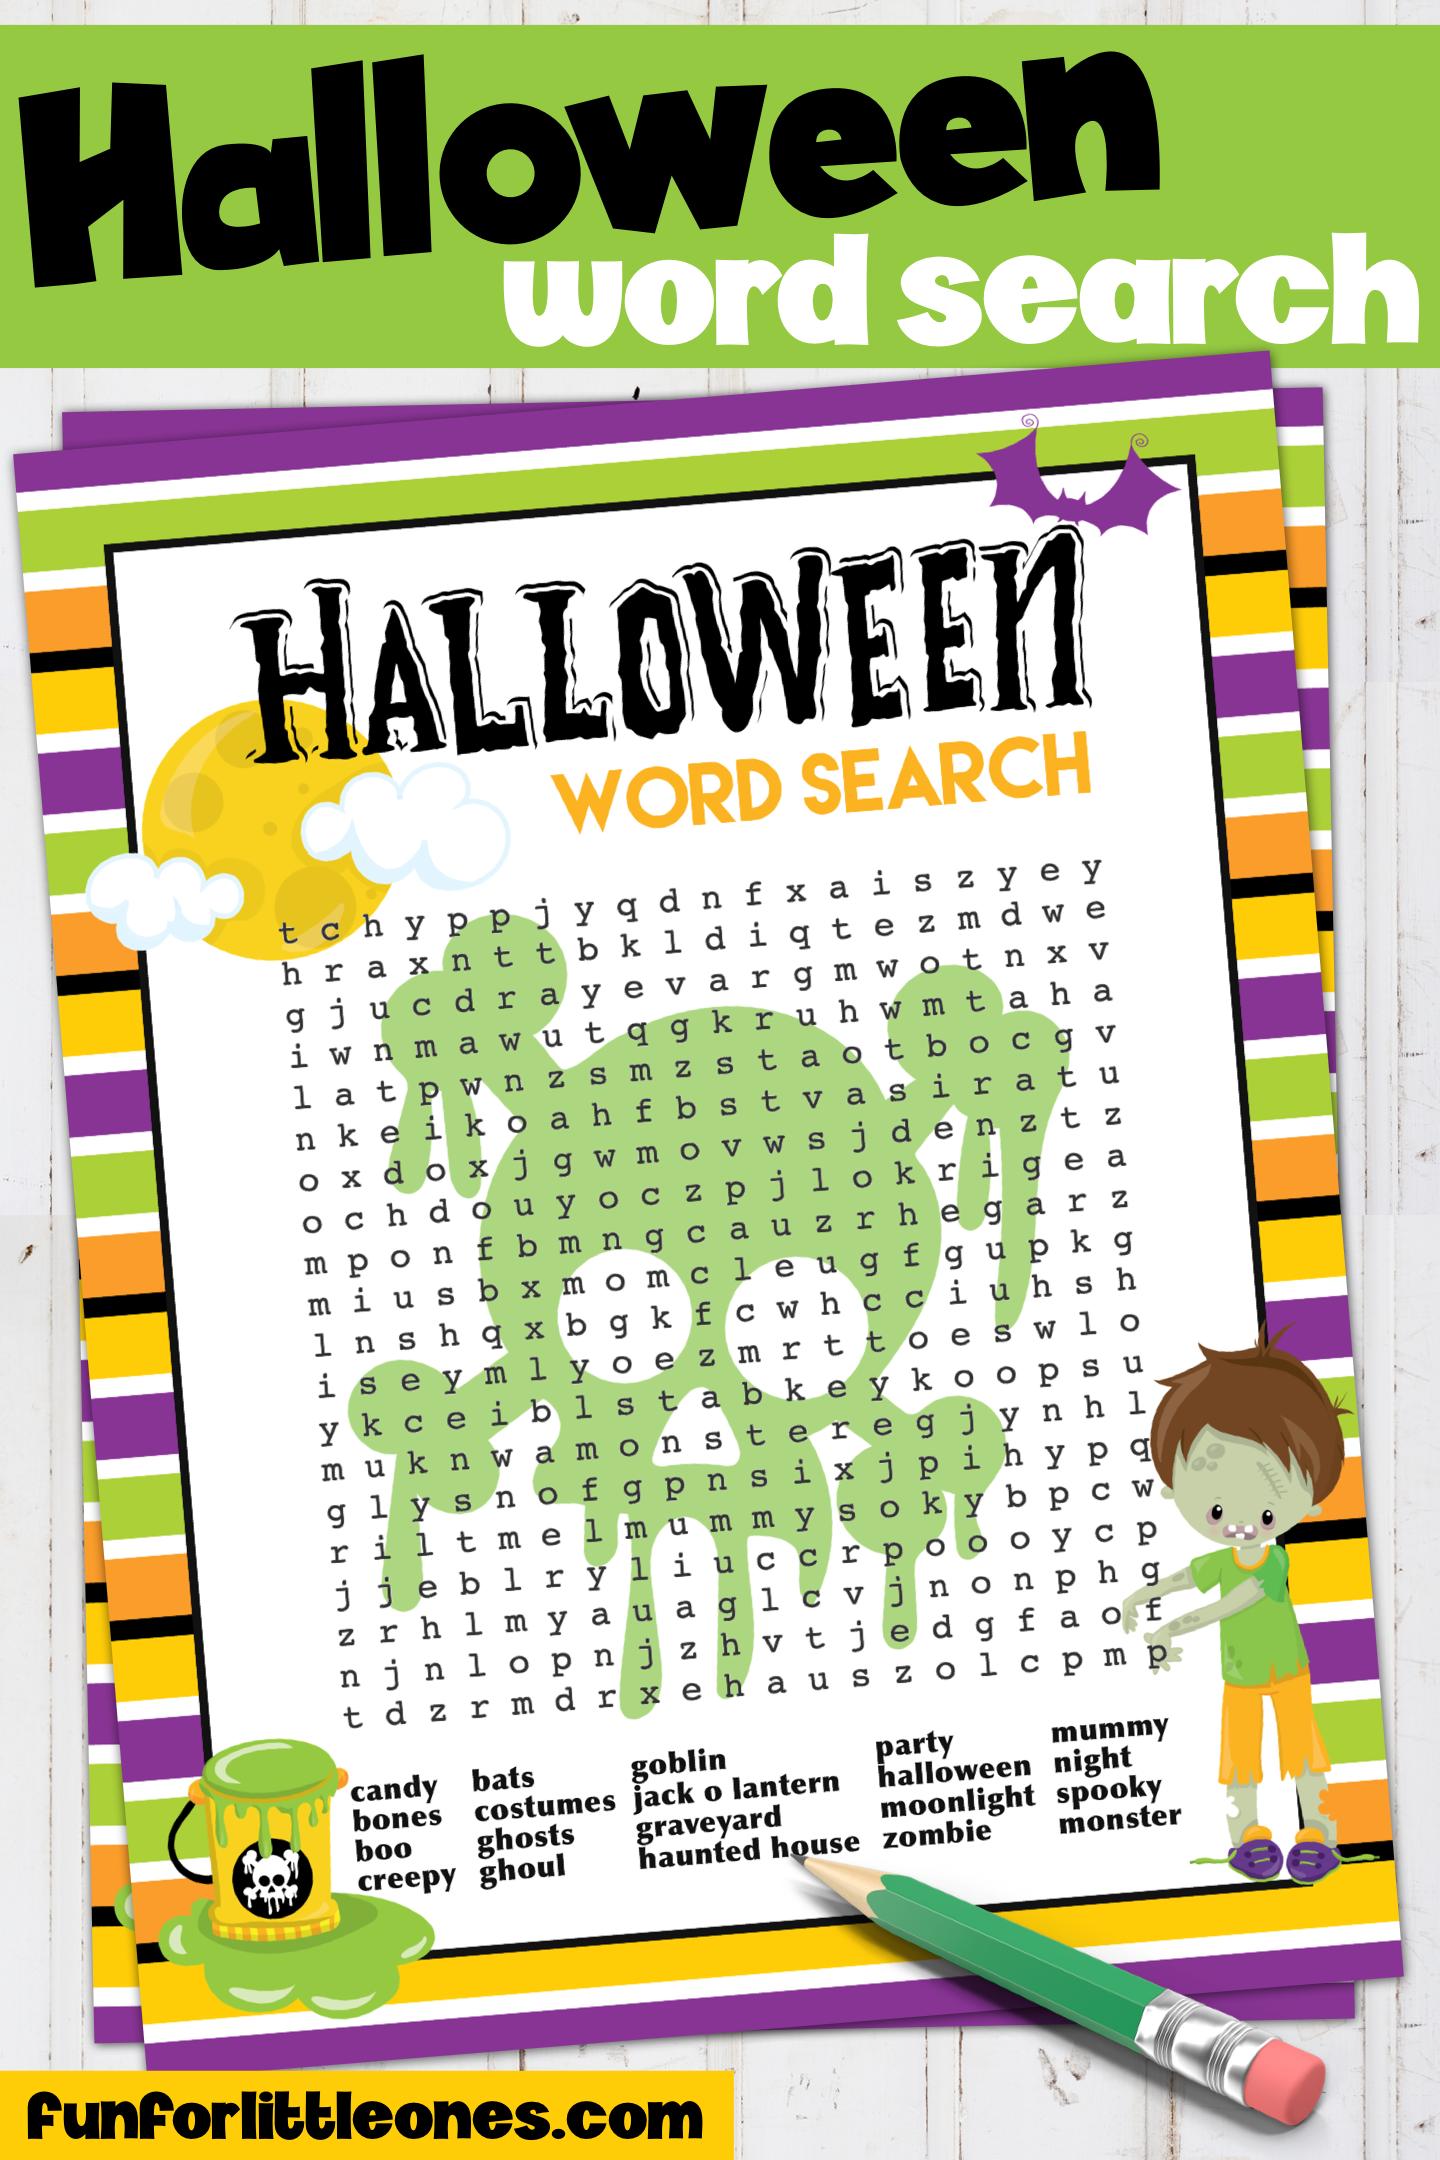 Halloween Word Search Printable